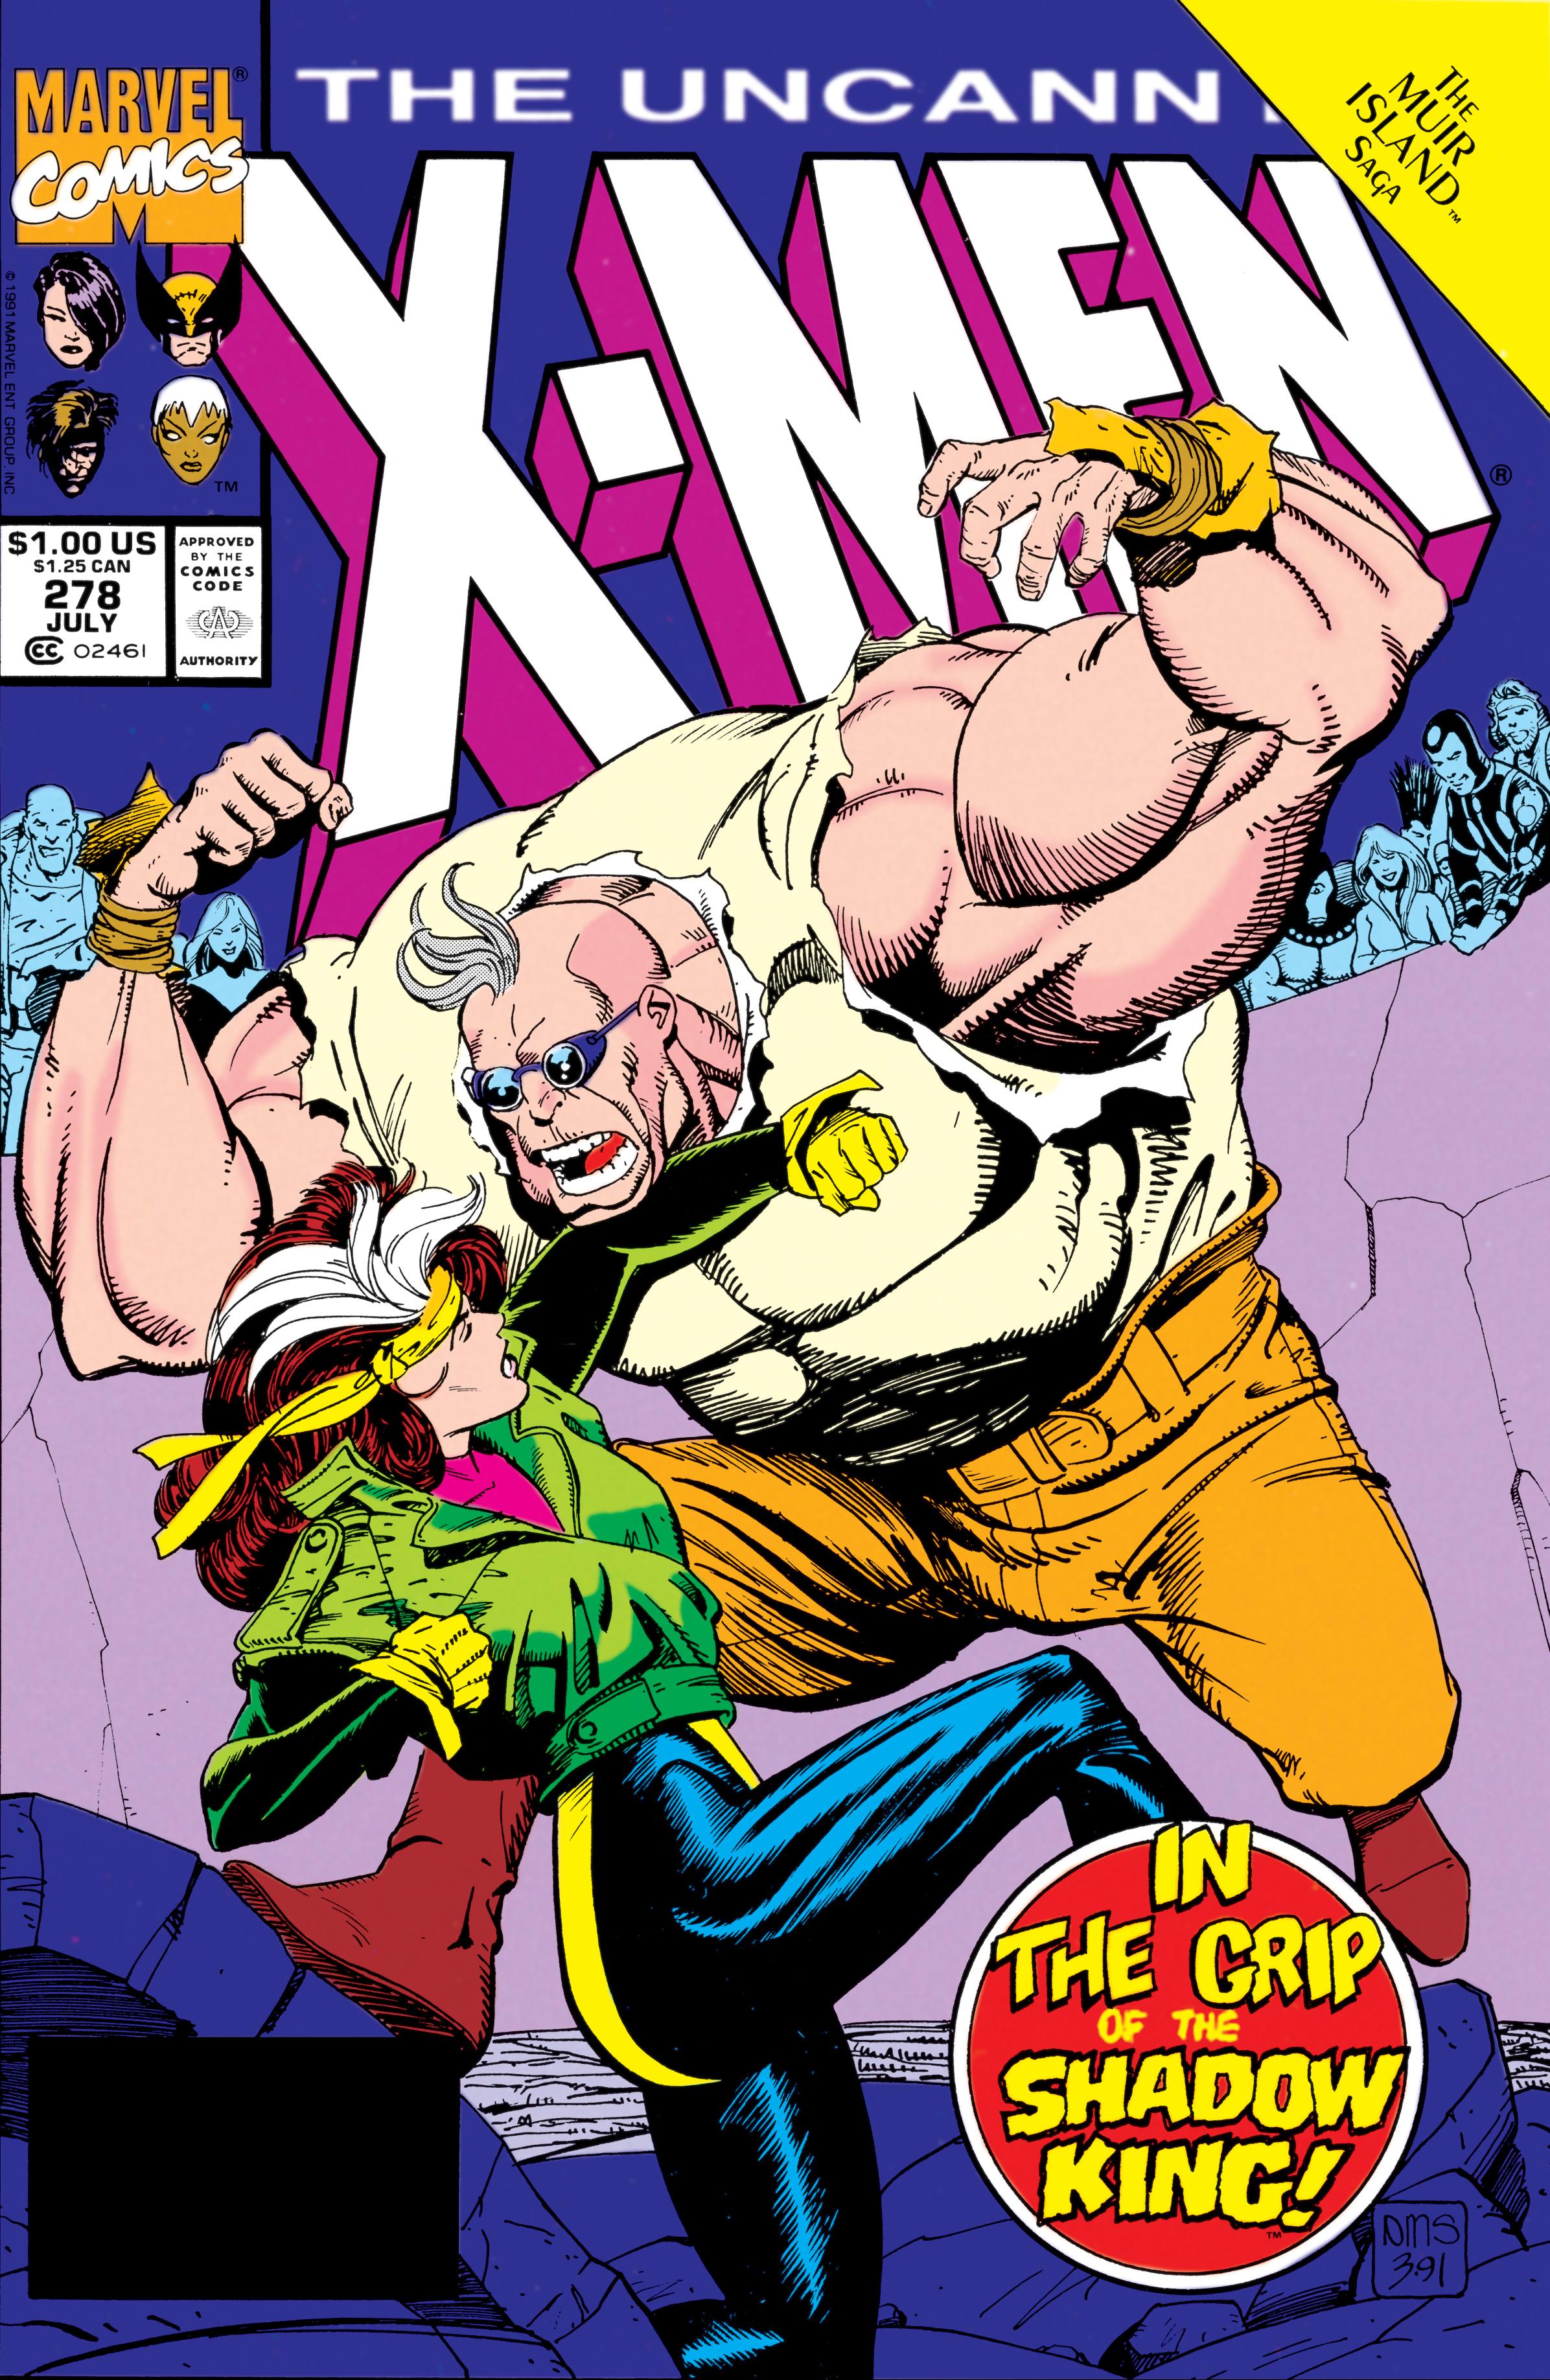 Uncanny X-Men (1963) #278